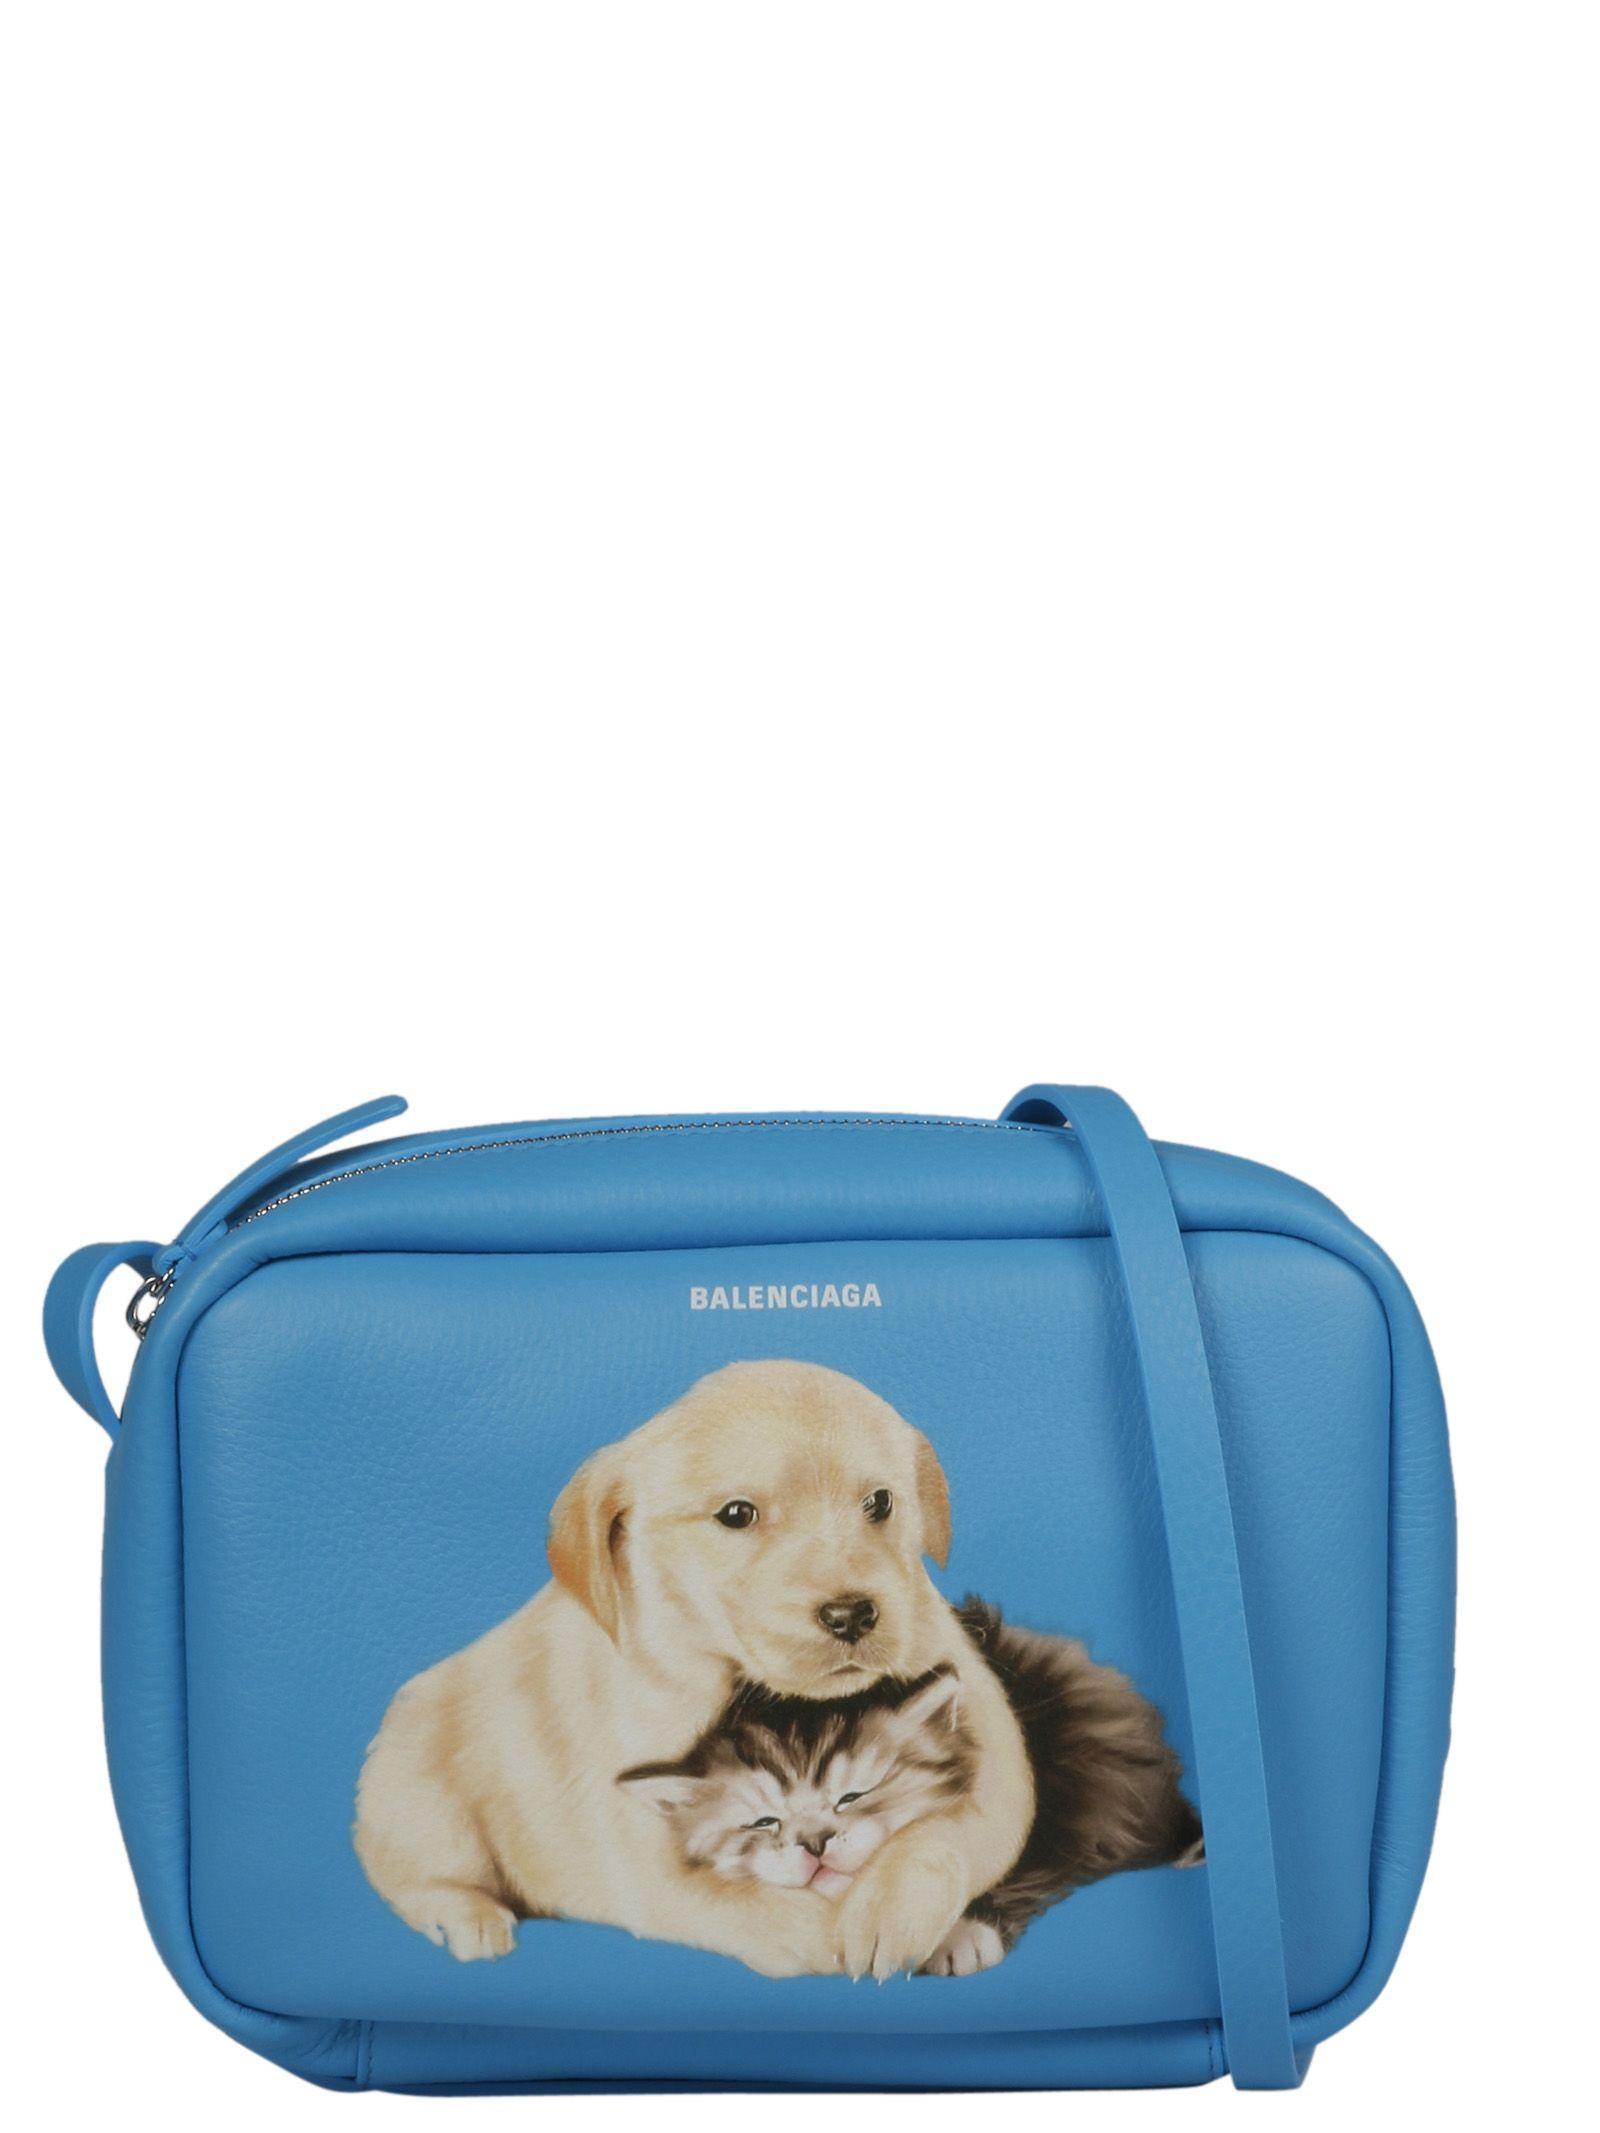 Balenciaga Puppy And Kitten Shoulder Bag In 4660